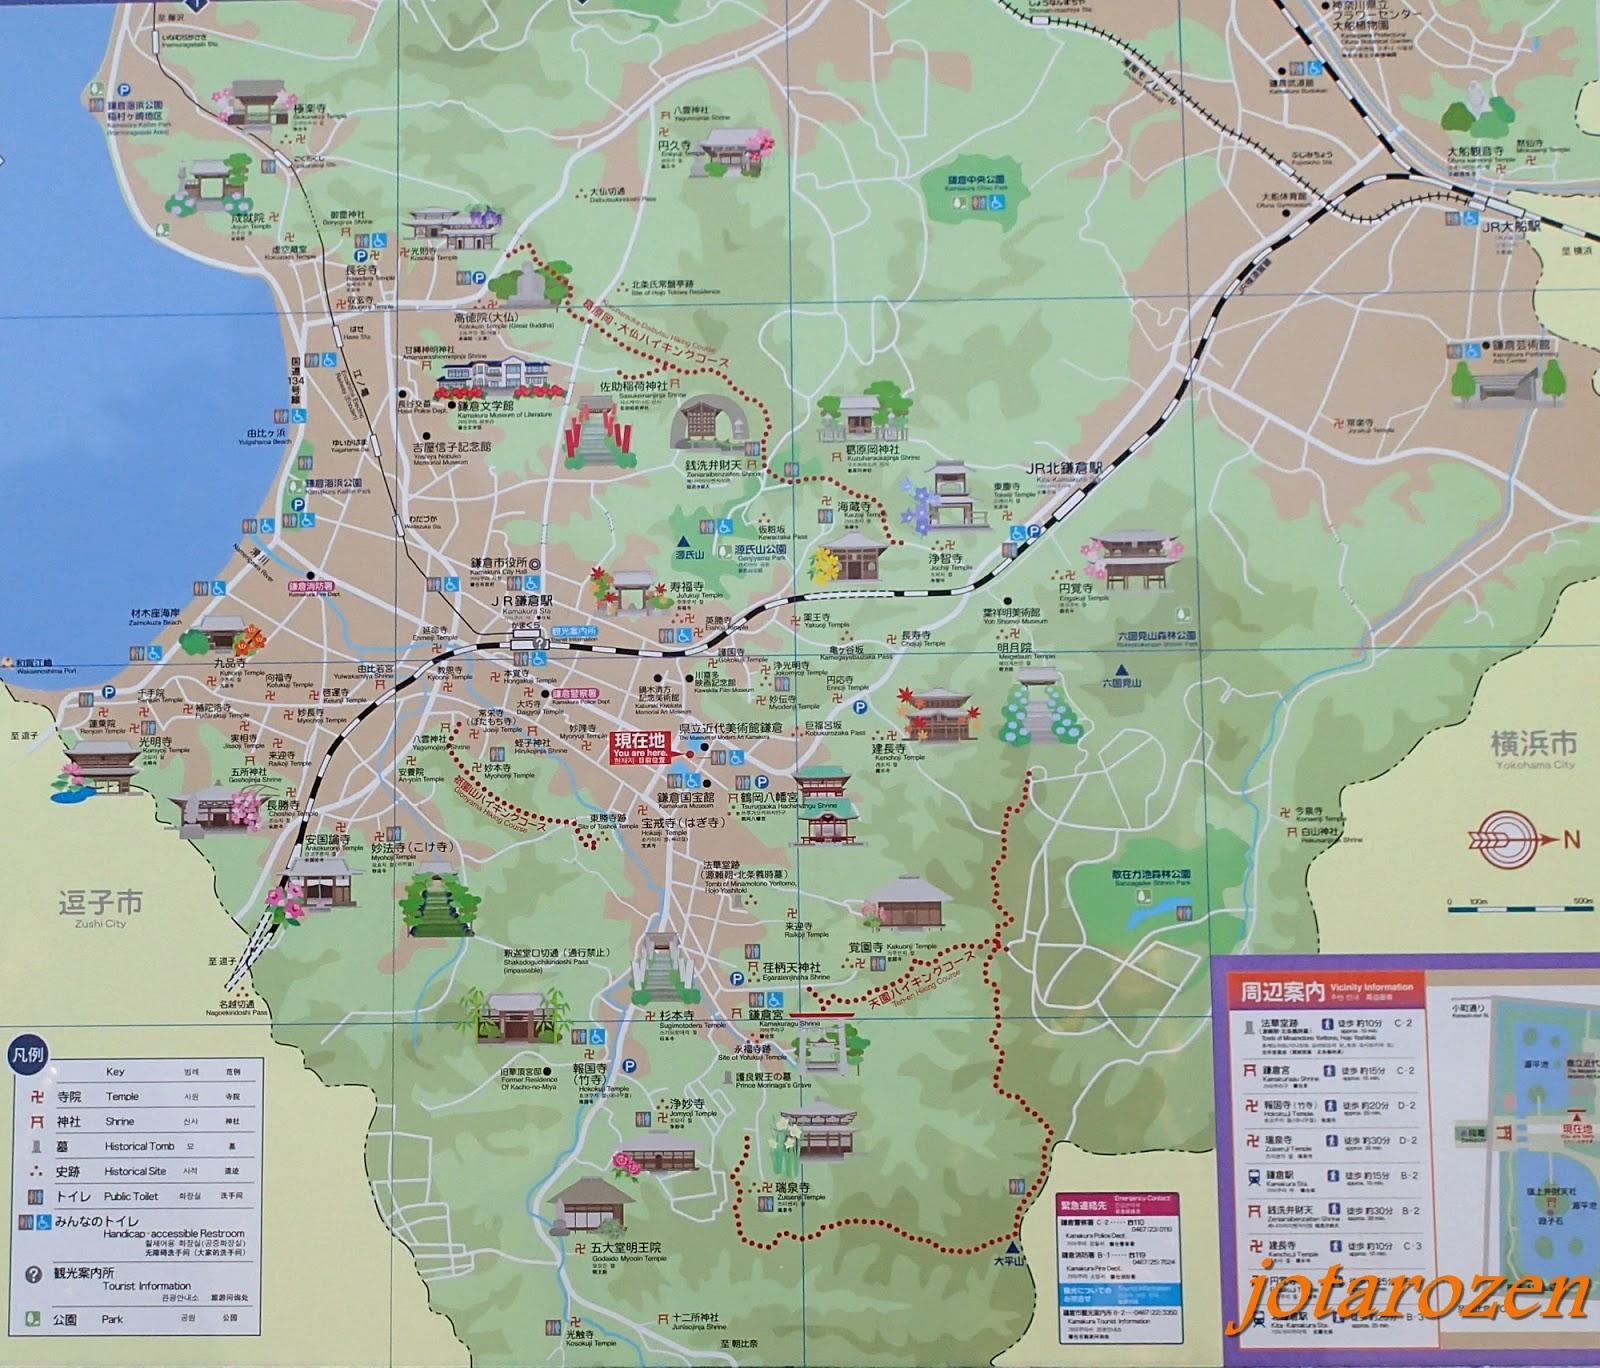 Footsteps Jotaros Travels Travel Tips JapanTokyo Kamakura – Japan Tourist Attractions Map